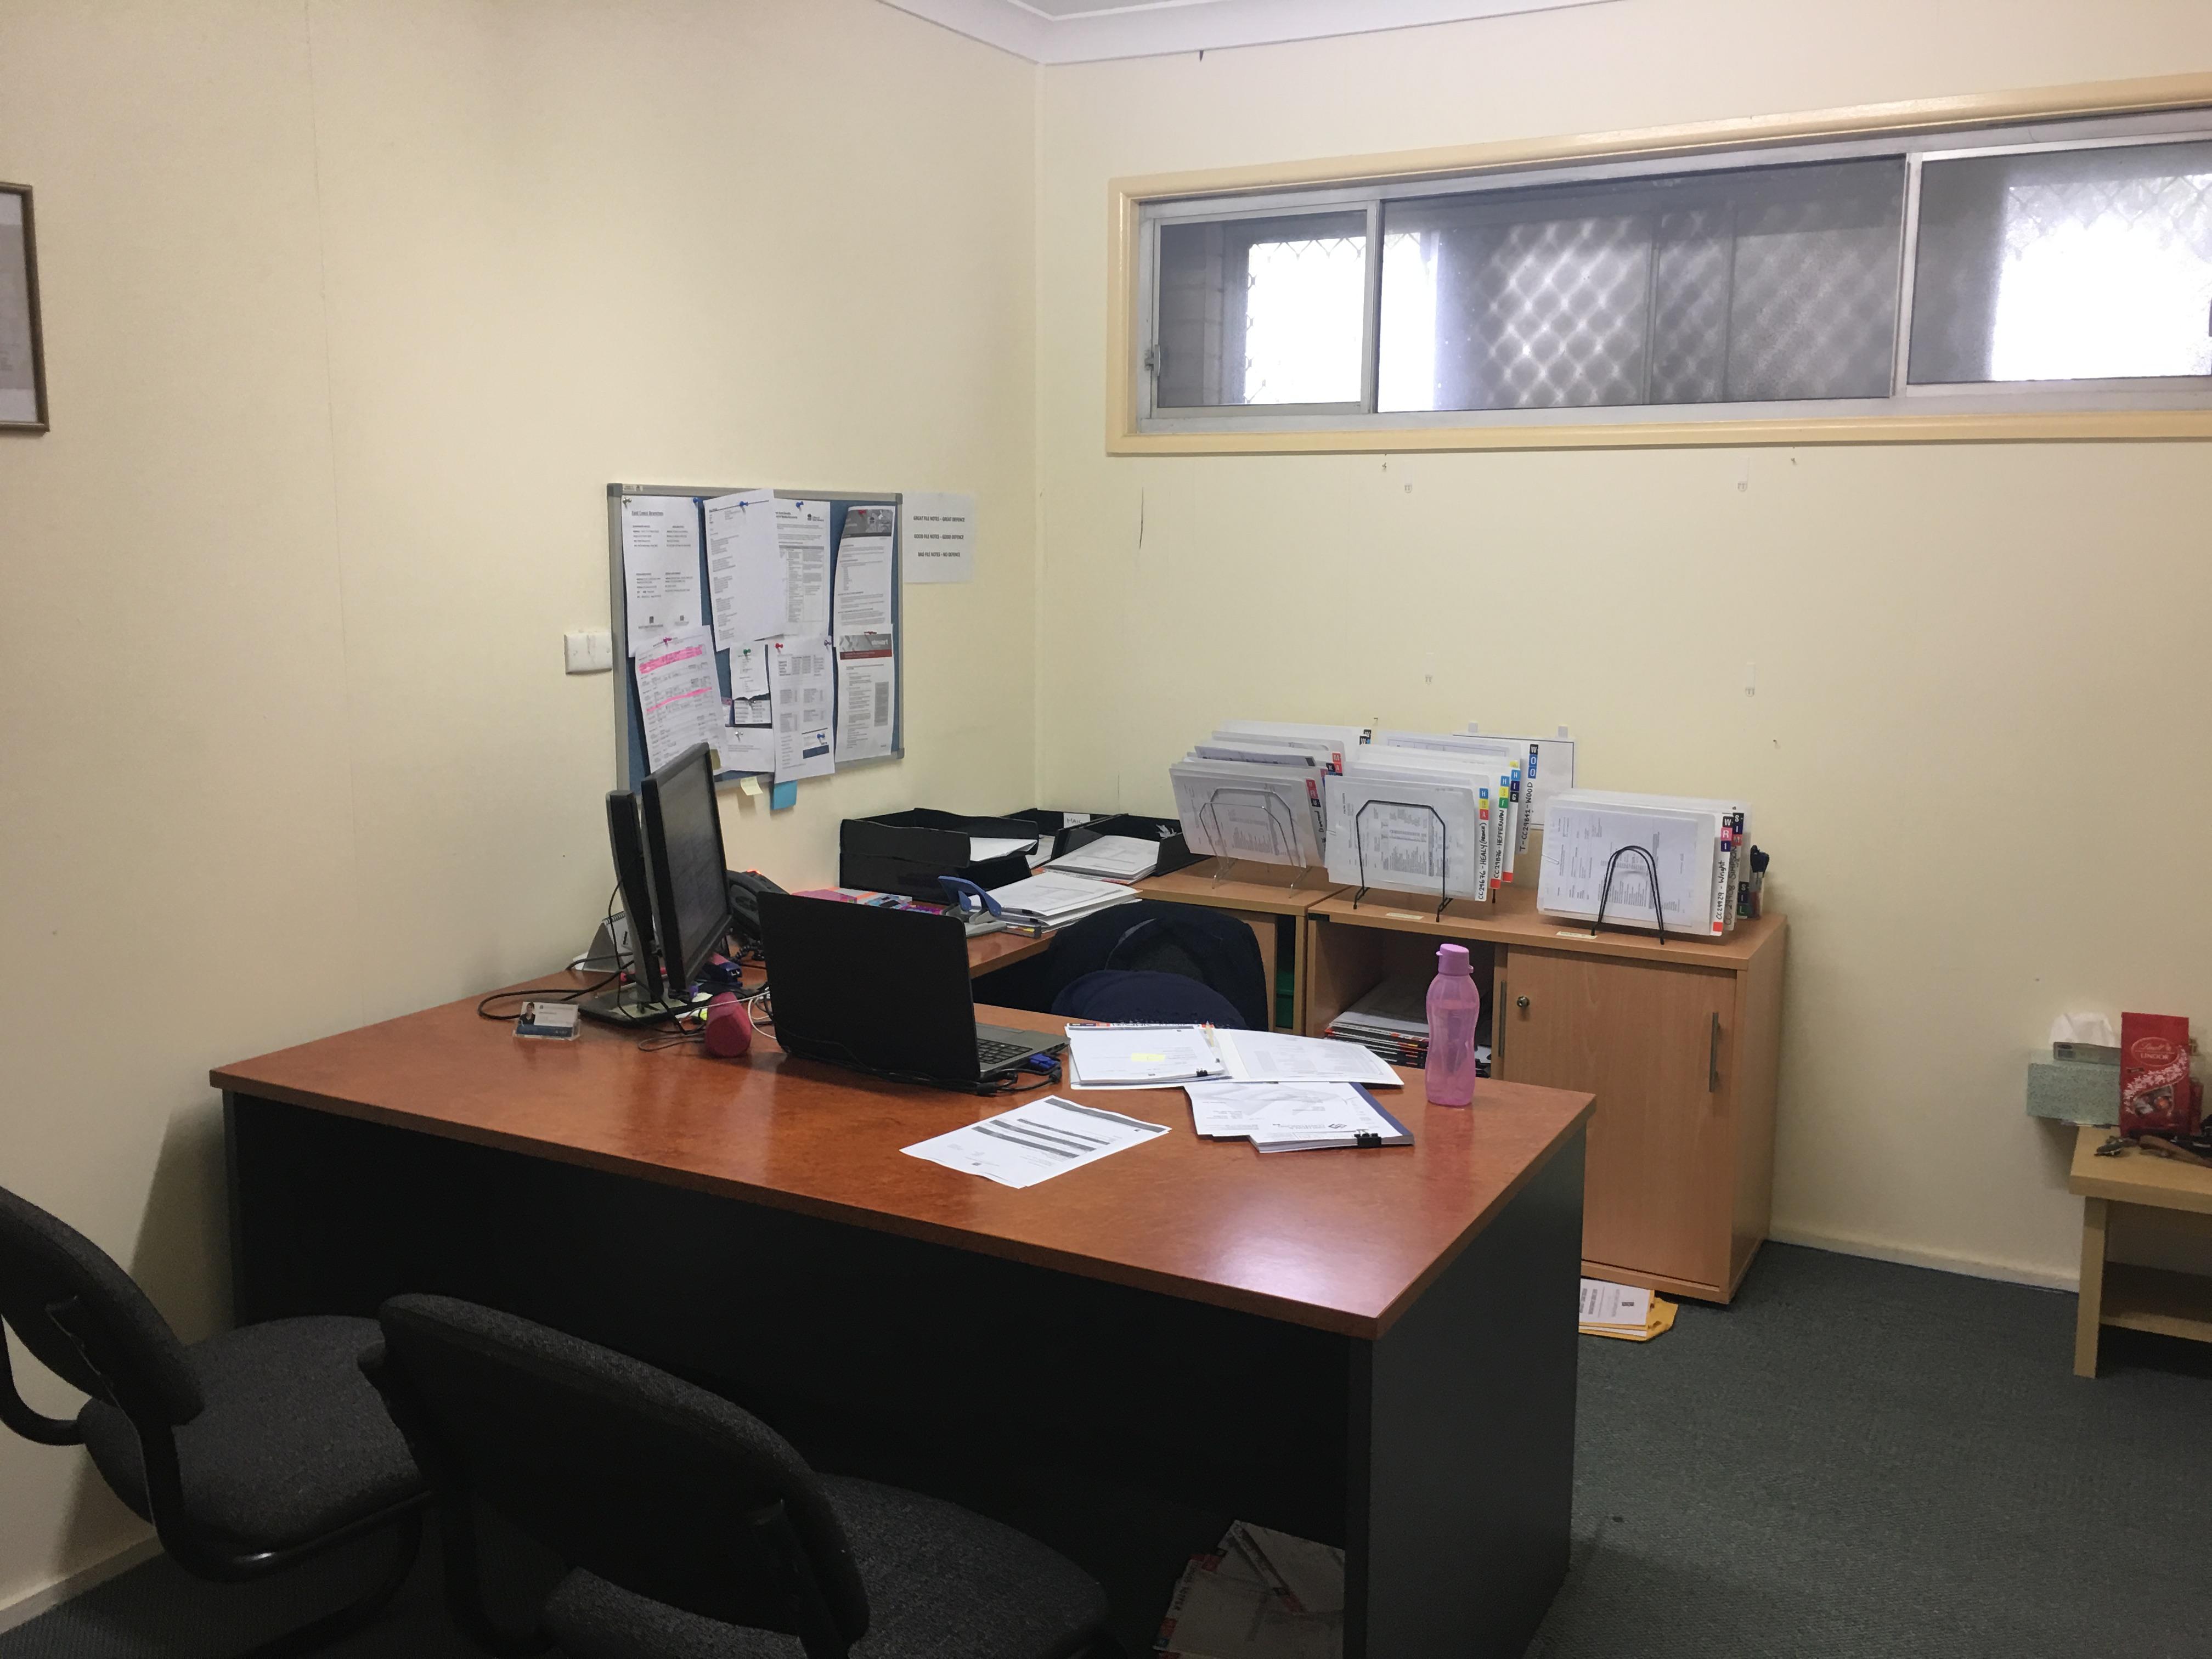 East Coast Conveyancing Toukley | 284 Main Road, Toukley, New South Wales 2263 | +61 2 8985 7153